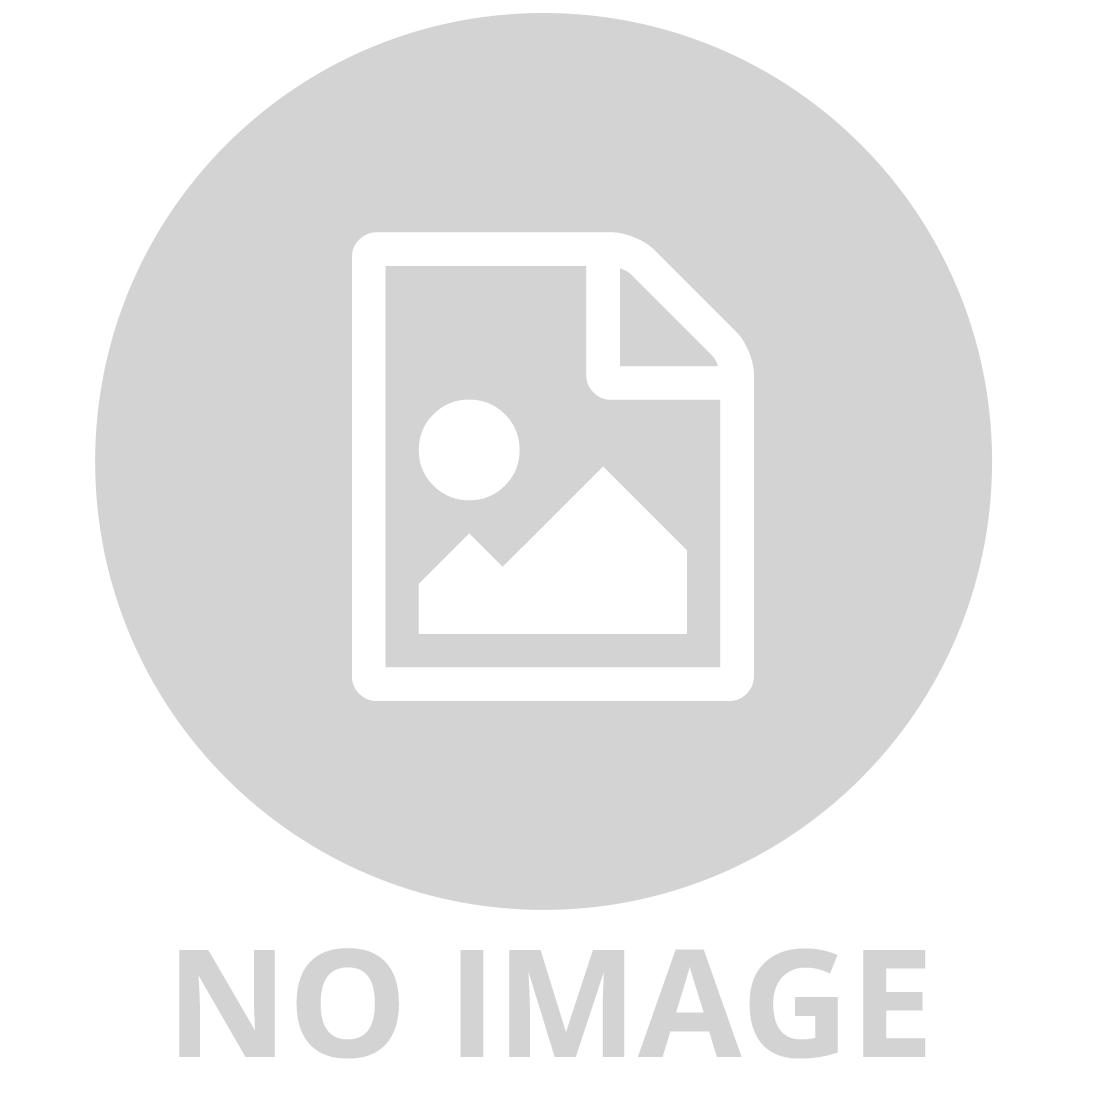 NAIL SWIRL ART